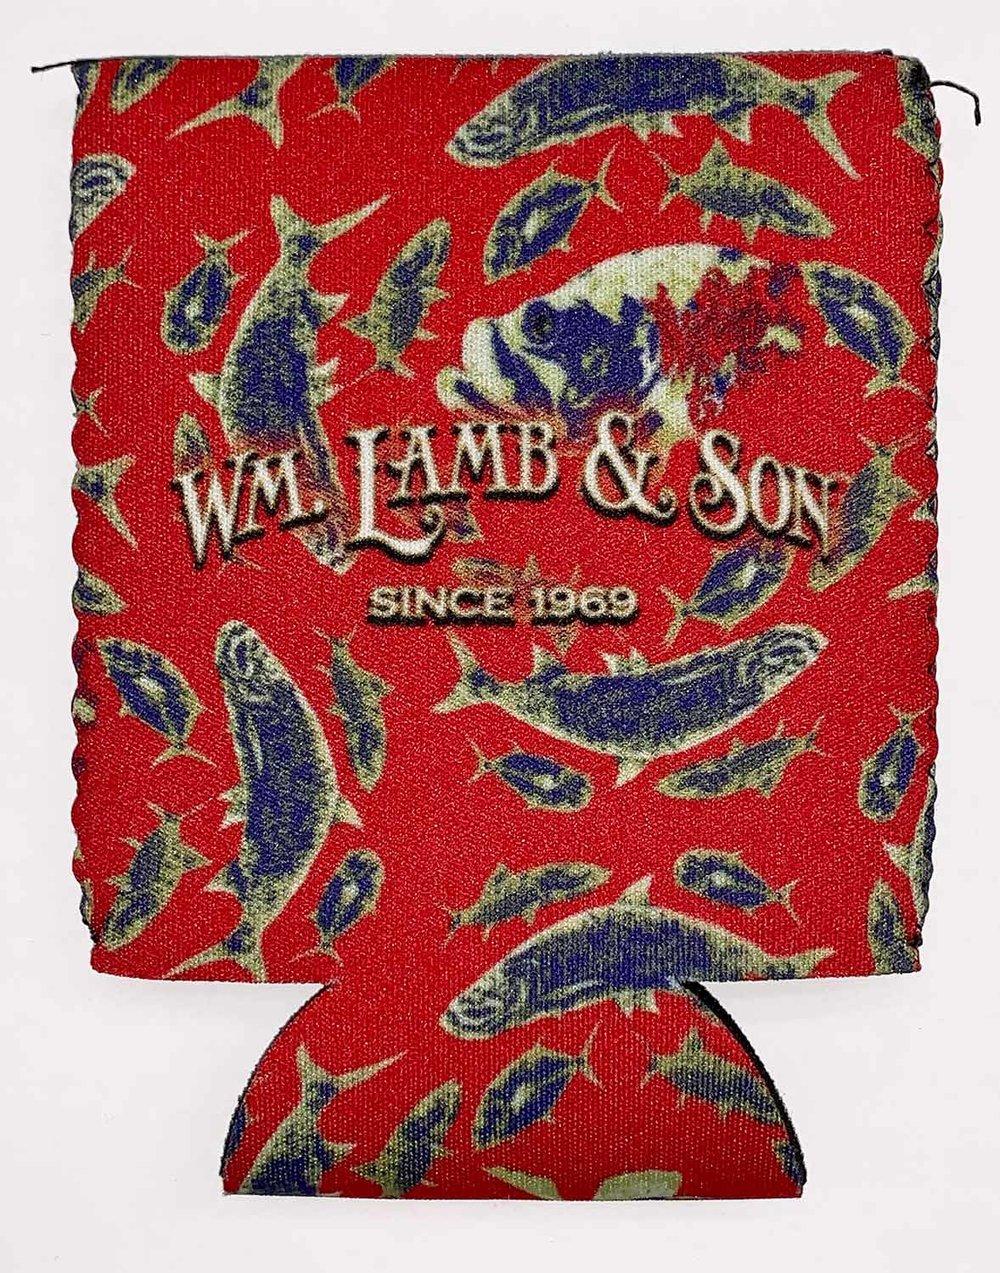 KYC_WM-Lamb&Son_redfishpatterncoozies_web.jpg